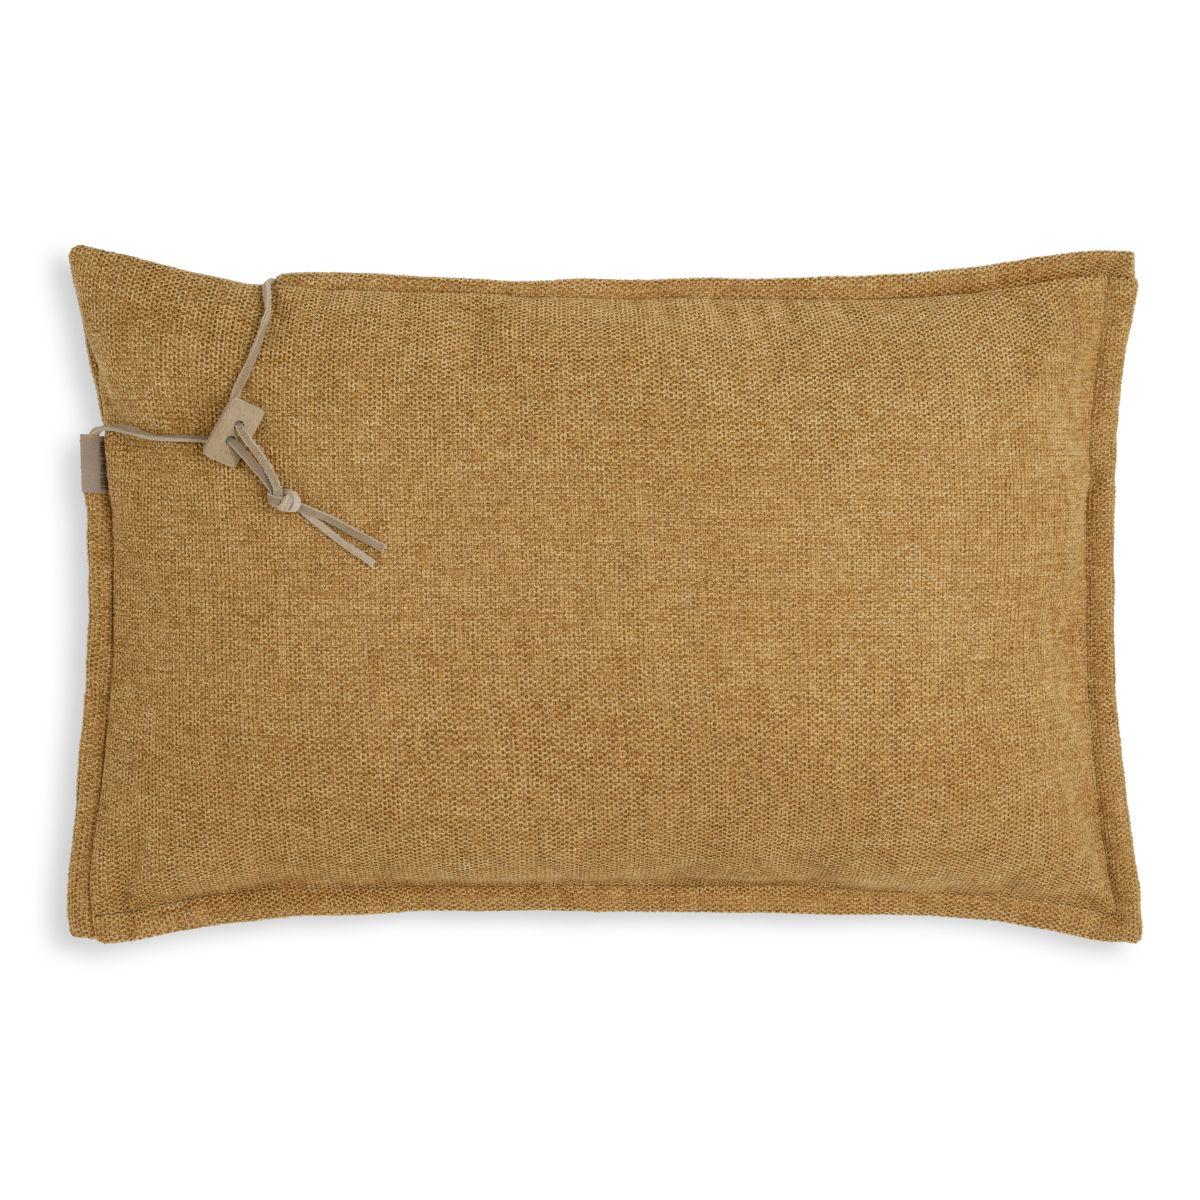 knit factory kf153013017 imre kussen oker 60x40 1